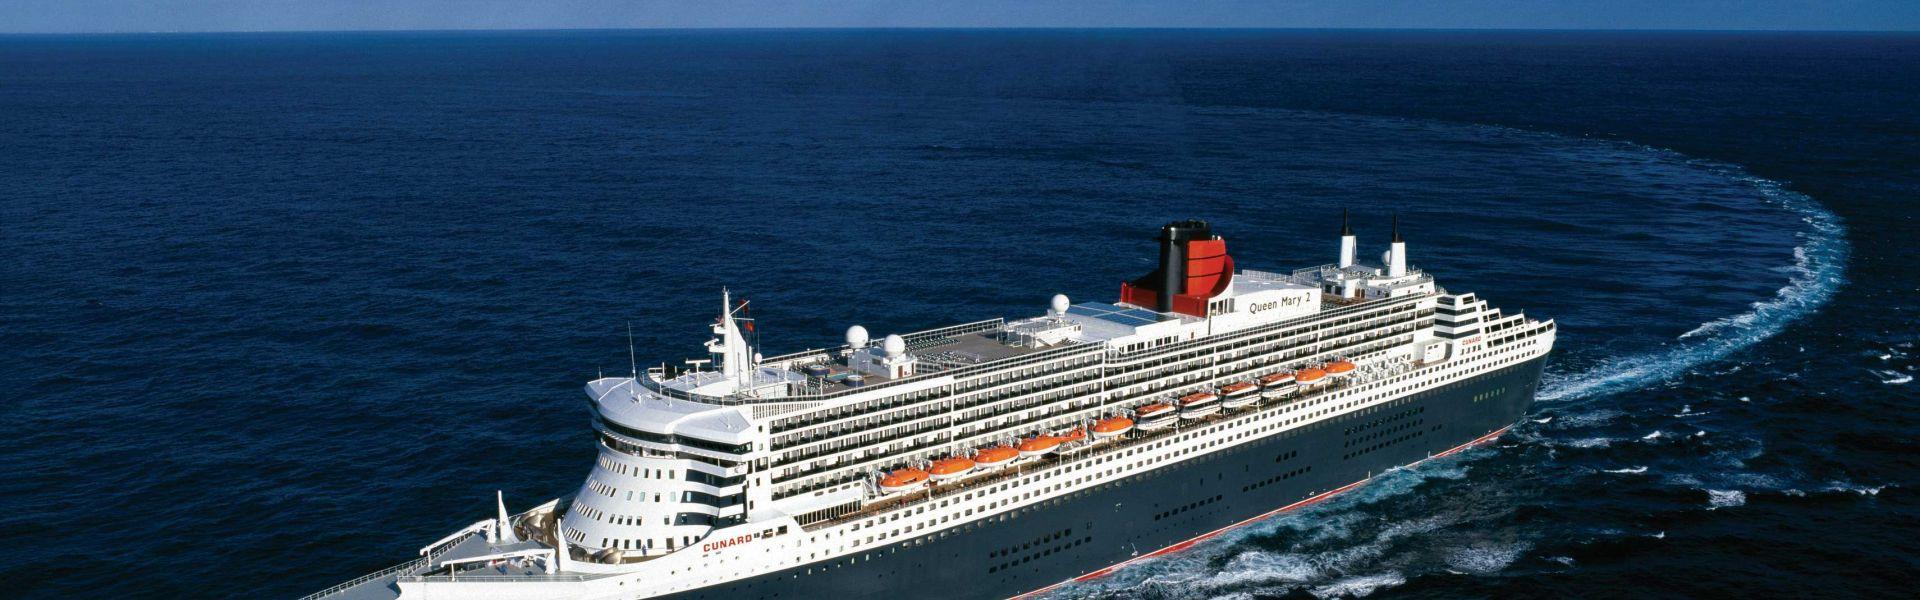 Croaziera 2019 - Repozitionari (Dubai) - Cunard Line - Queen Mary 2 - 20 nopti